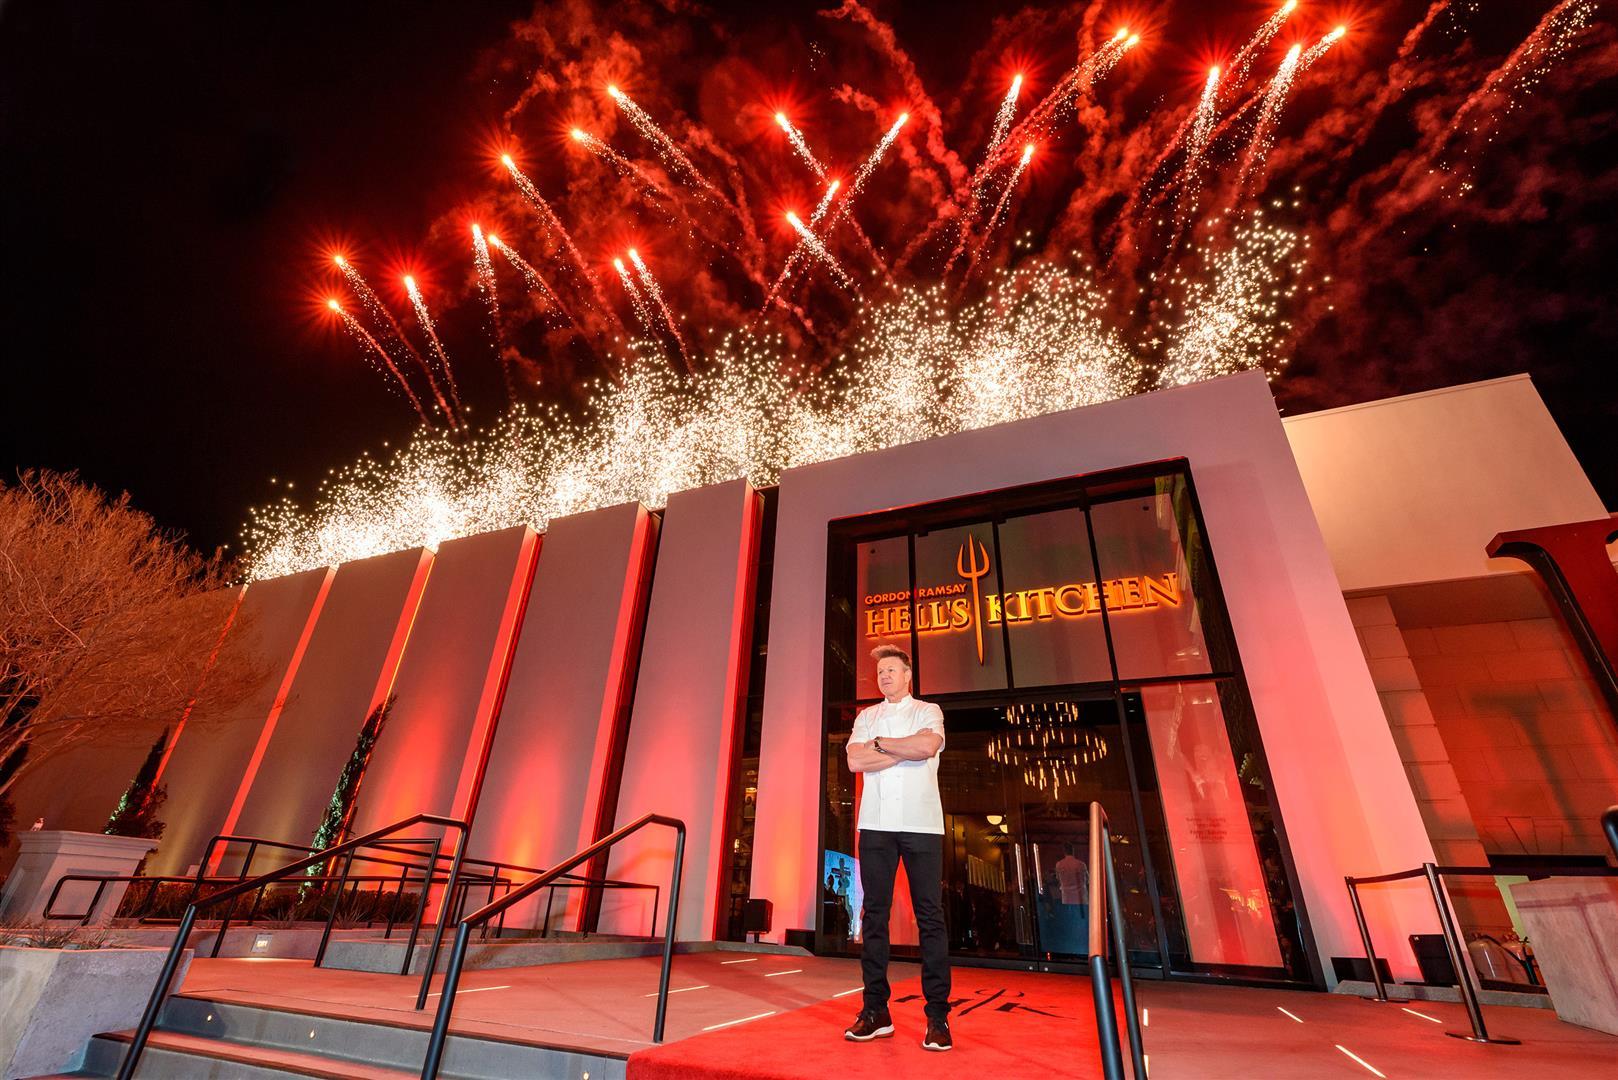 World S First Gordon Ramsay Hell S Kitchen Restaurant Opening At Caesars Palace Las Vegas